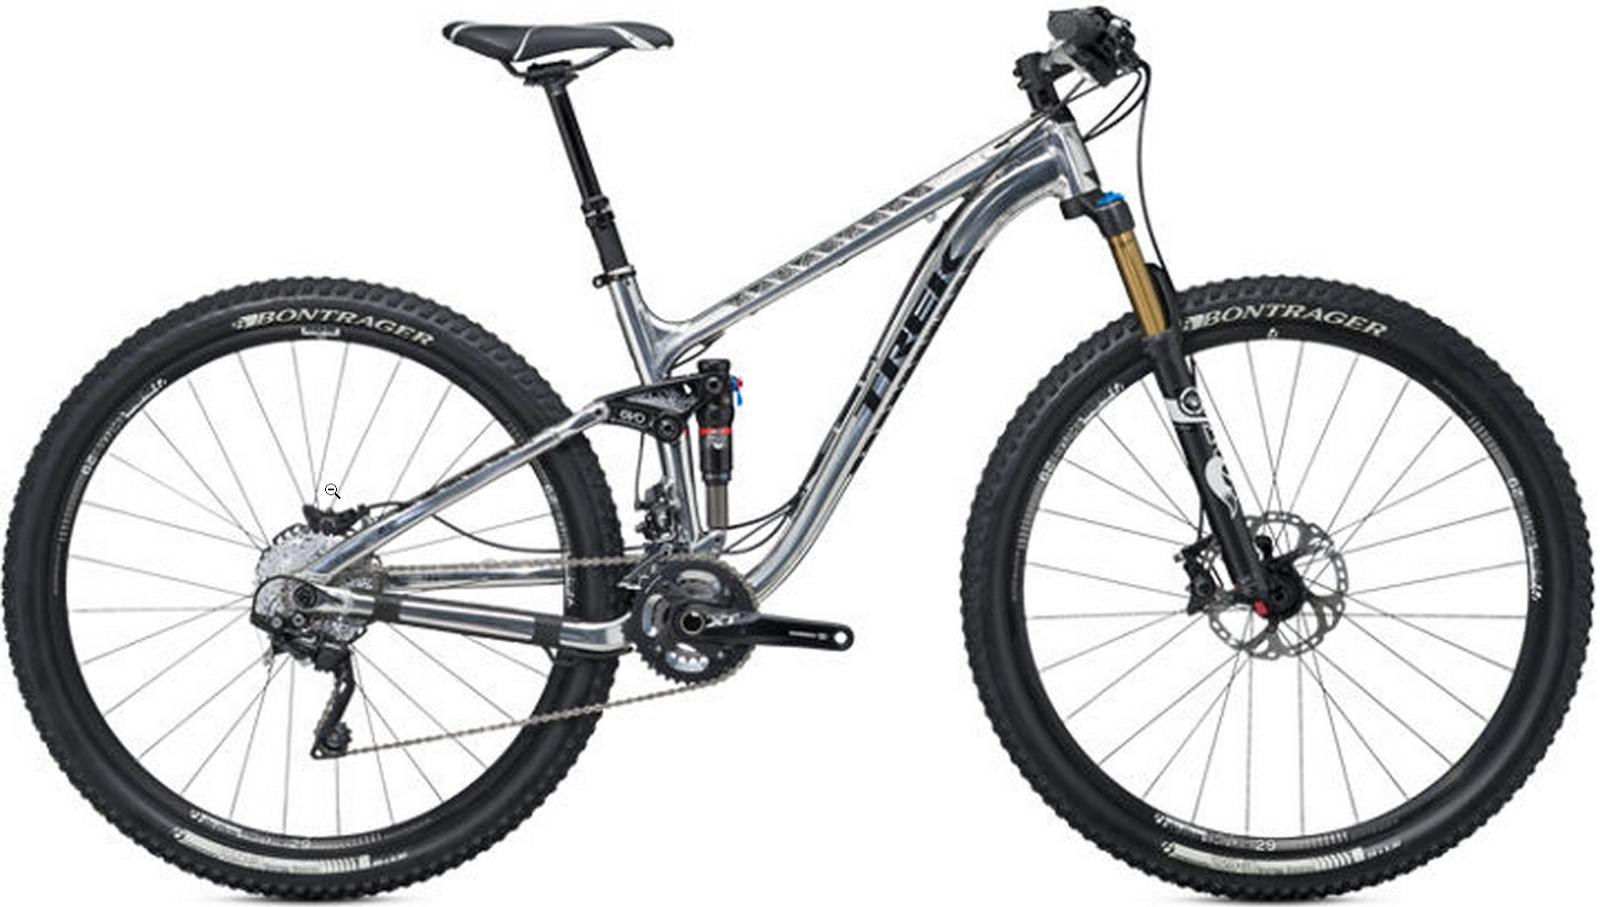 2014 Trek Fuel EX 9